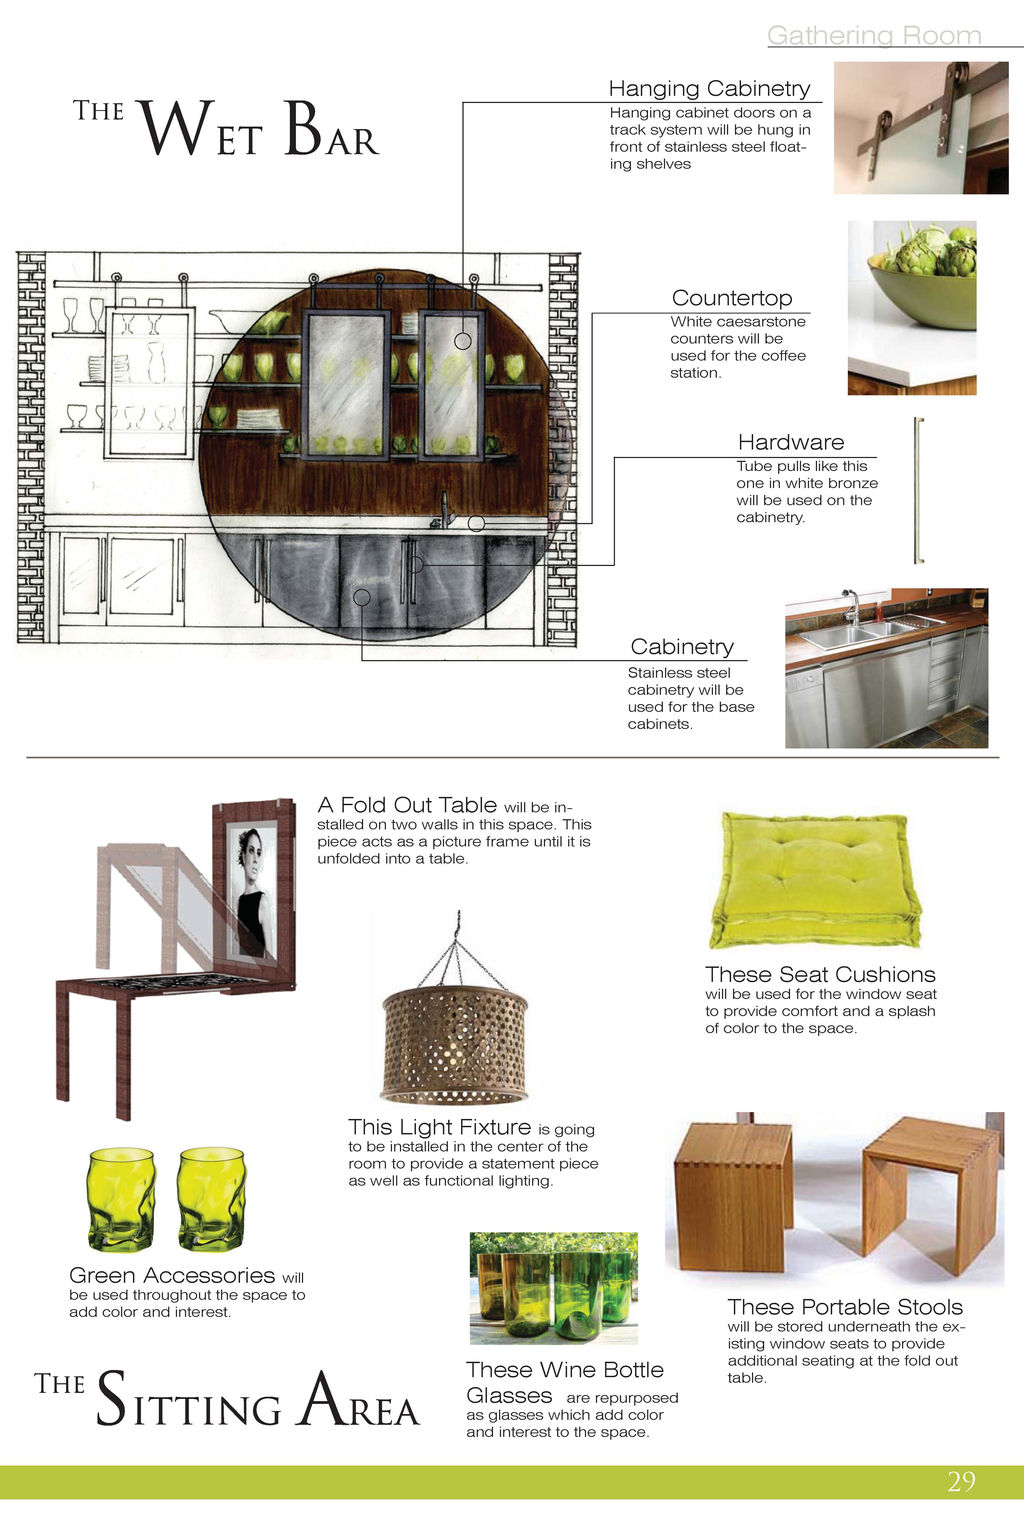 Interior design courses in houston house design and for Interior design certification